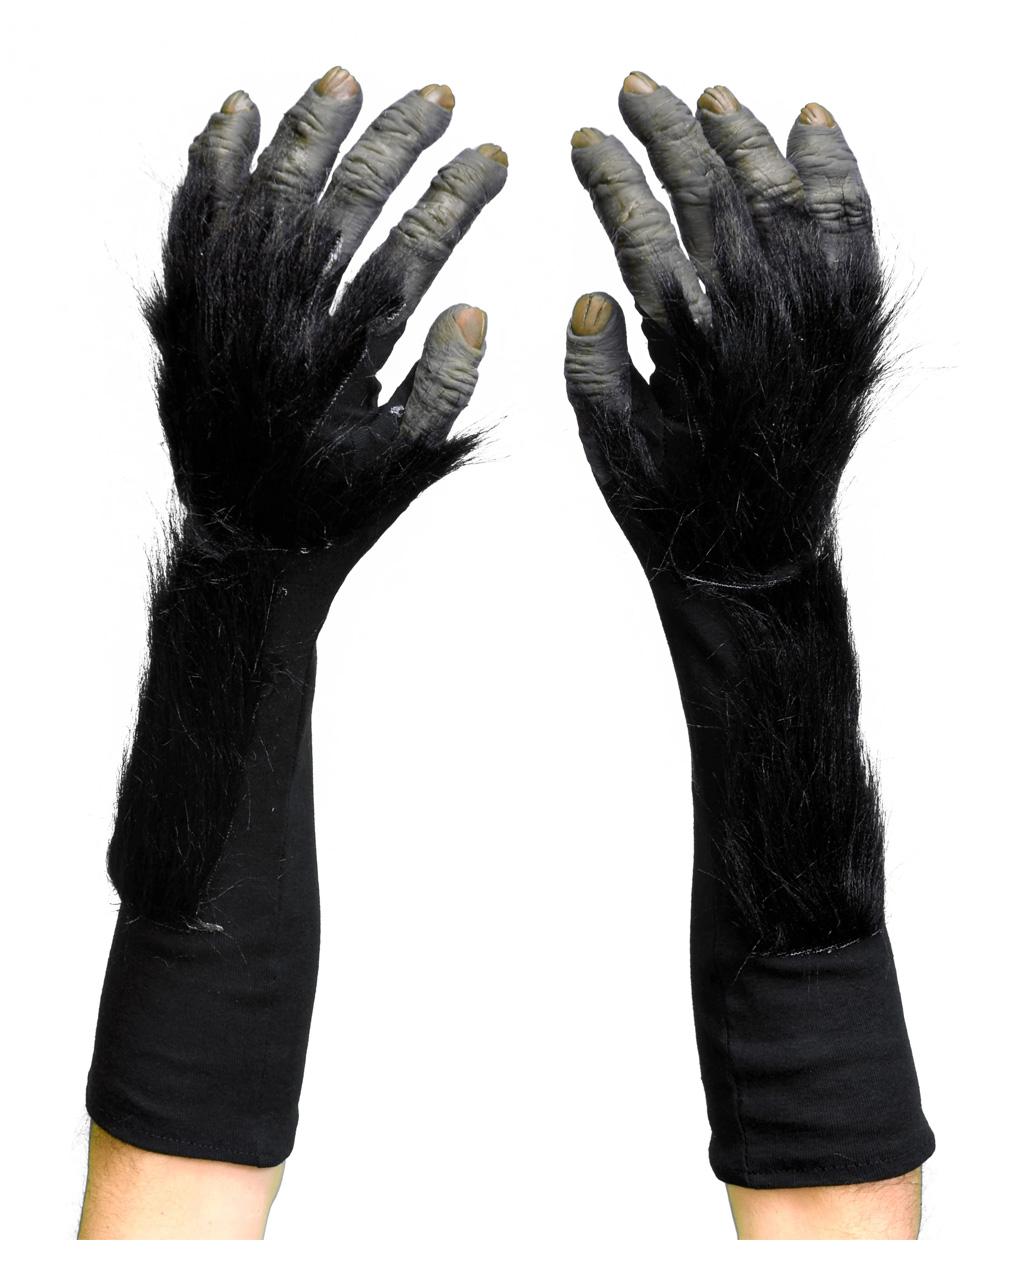 Animal Gloves Gorilla Fancy Dress Paws Hands Rubber Chimp With Black Fur Pair